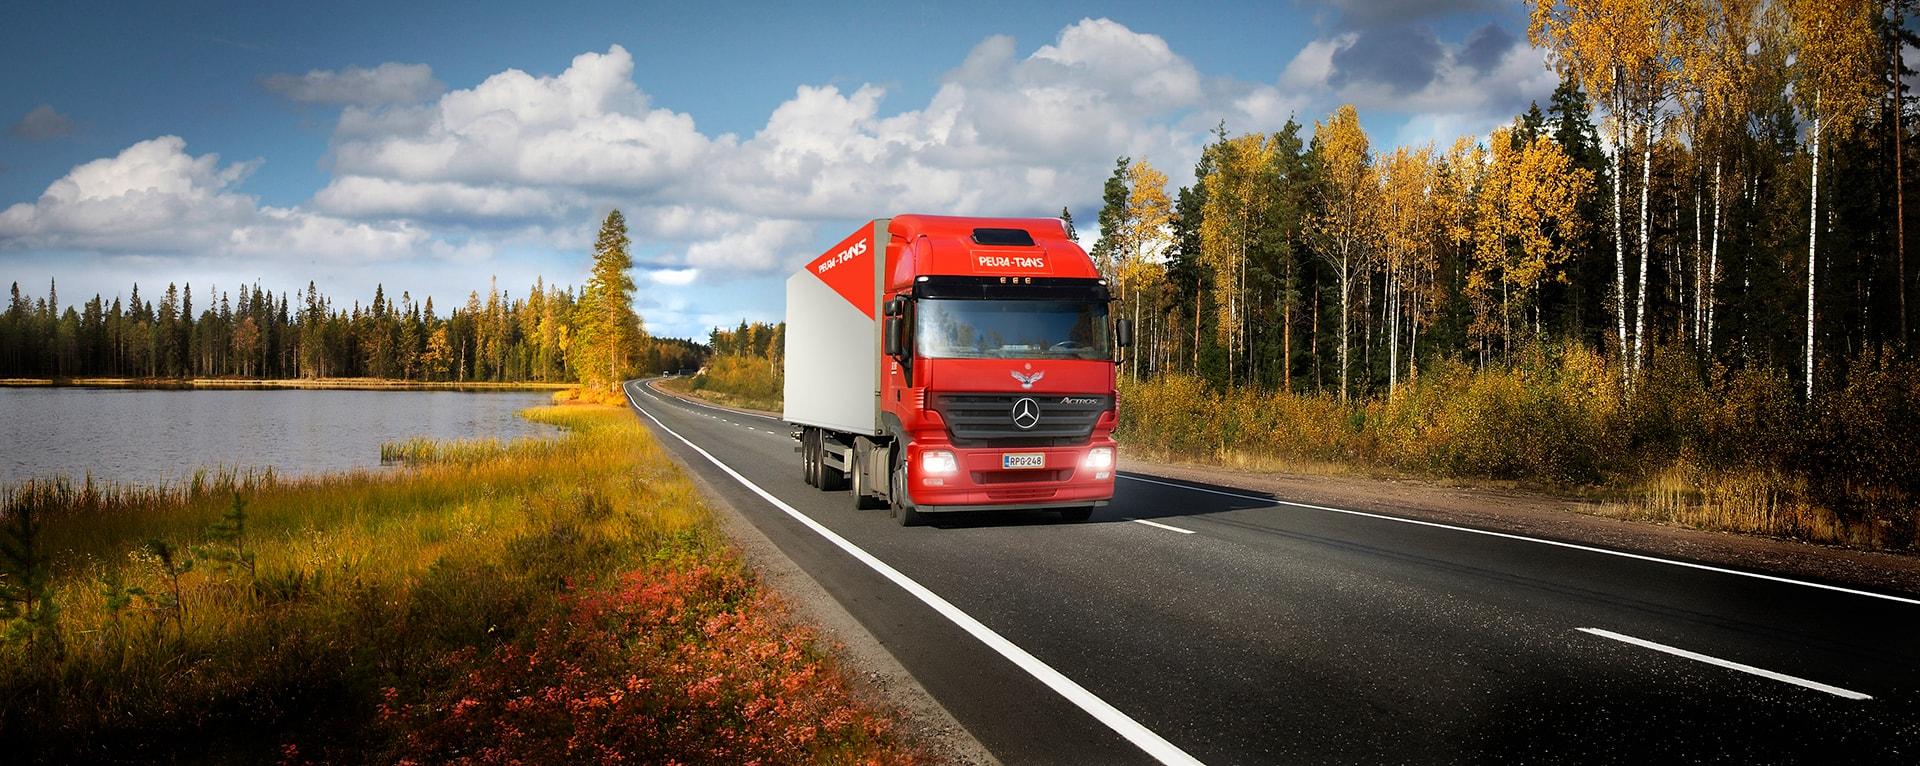 Peura-Trans truck on a small finnish road